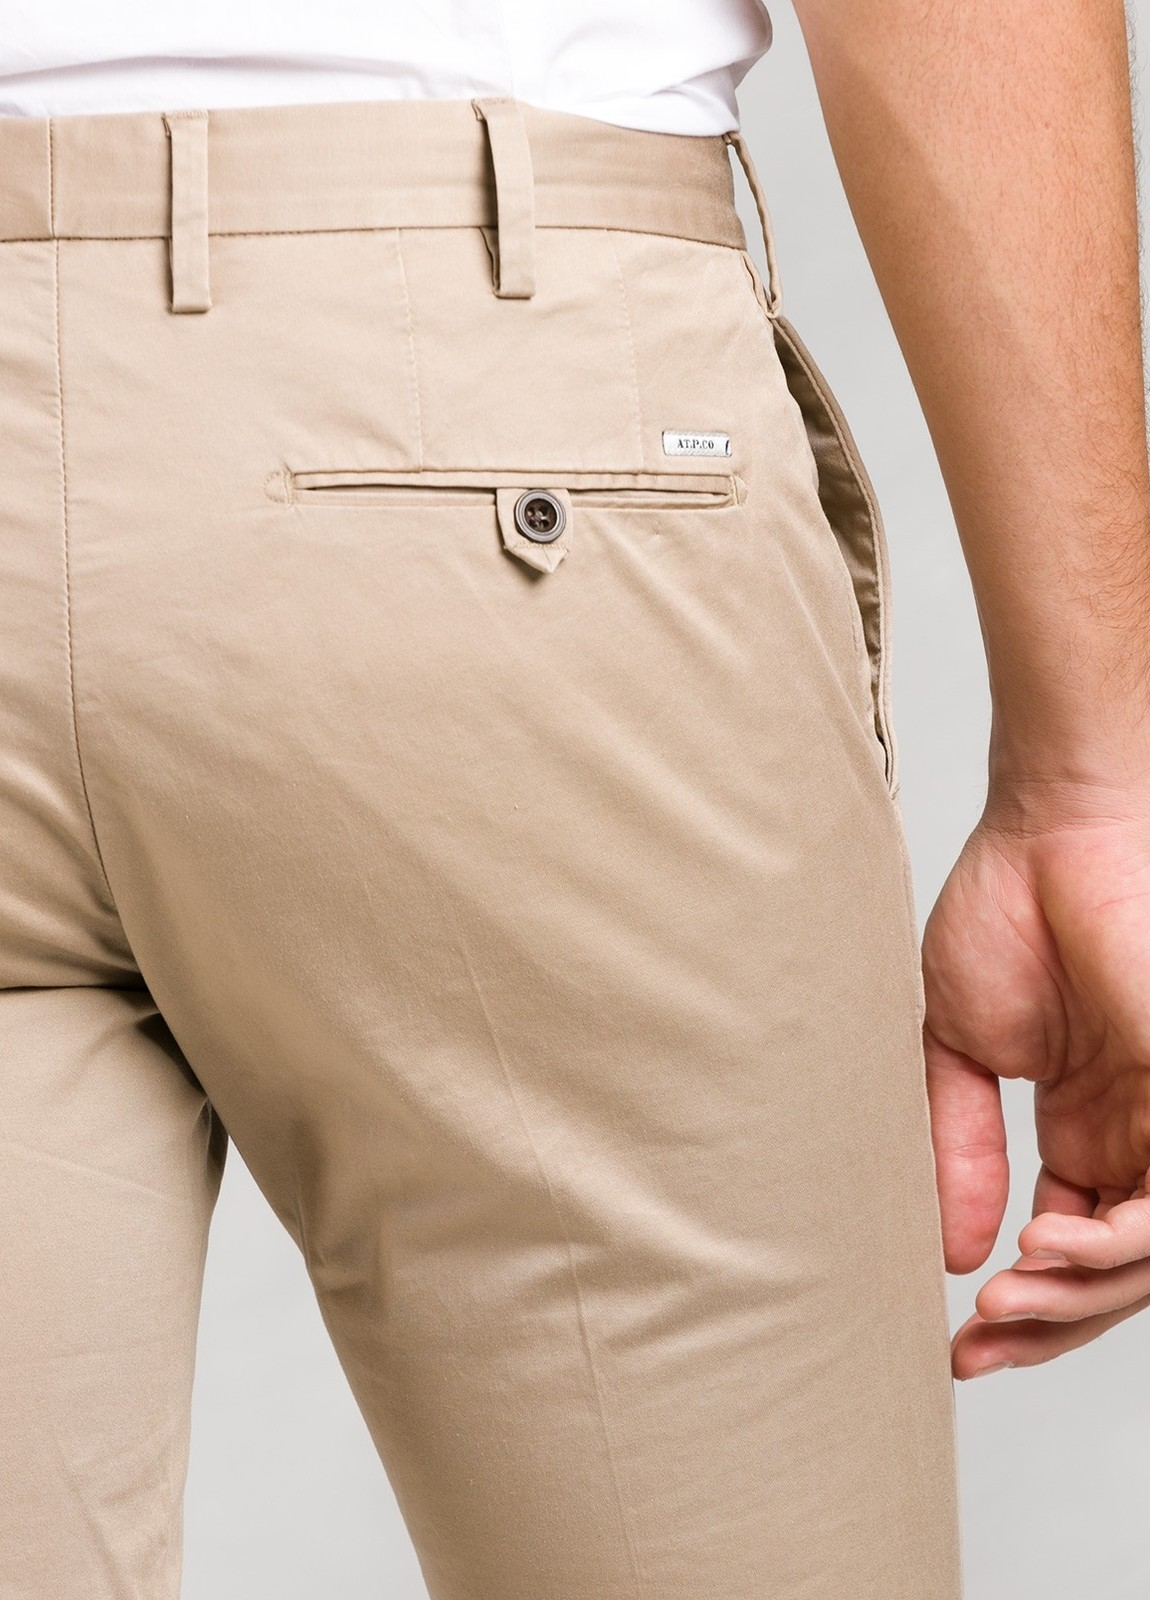 Pantalón sport color beige ligeramente slim fit, algodón satinado. - Ítem2